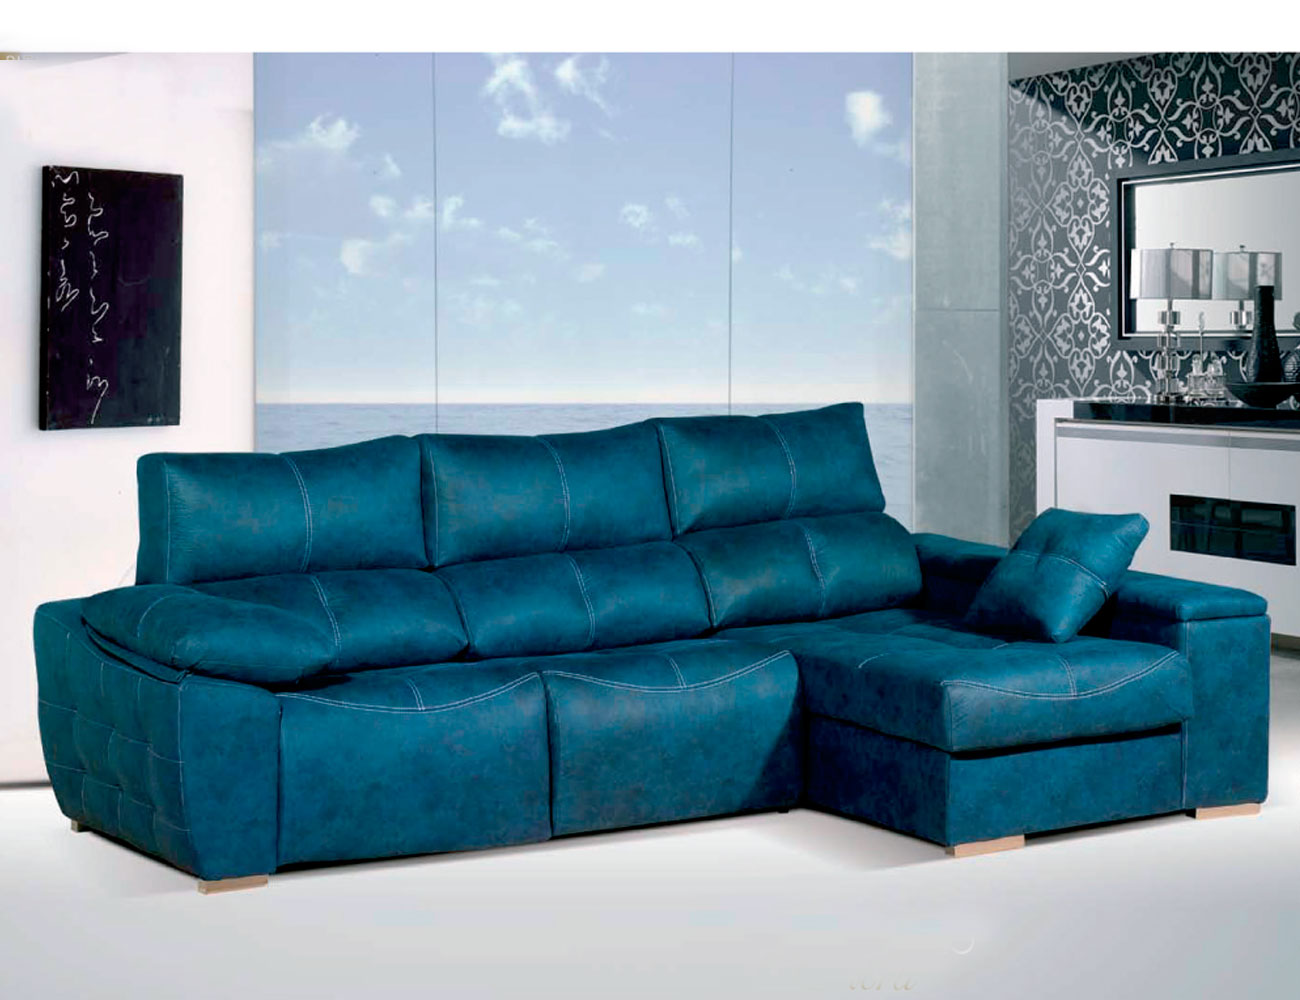 Sofa chaiselongue relax 2 motores anti manchas turquesa23